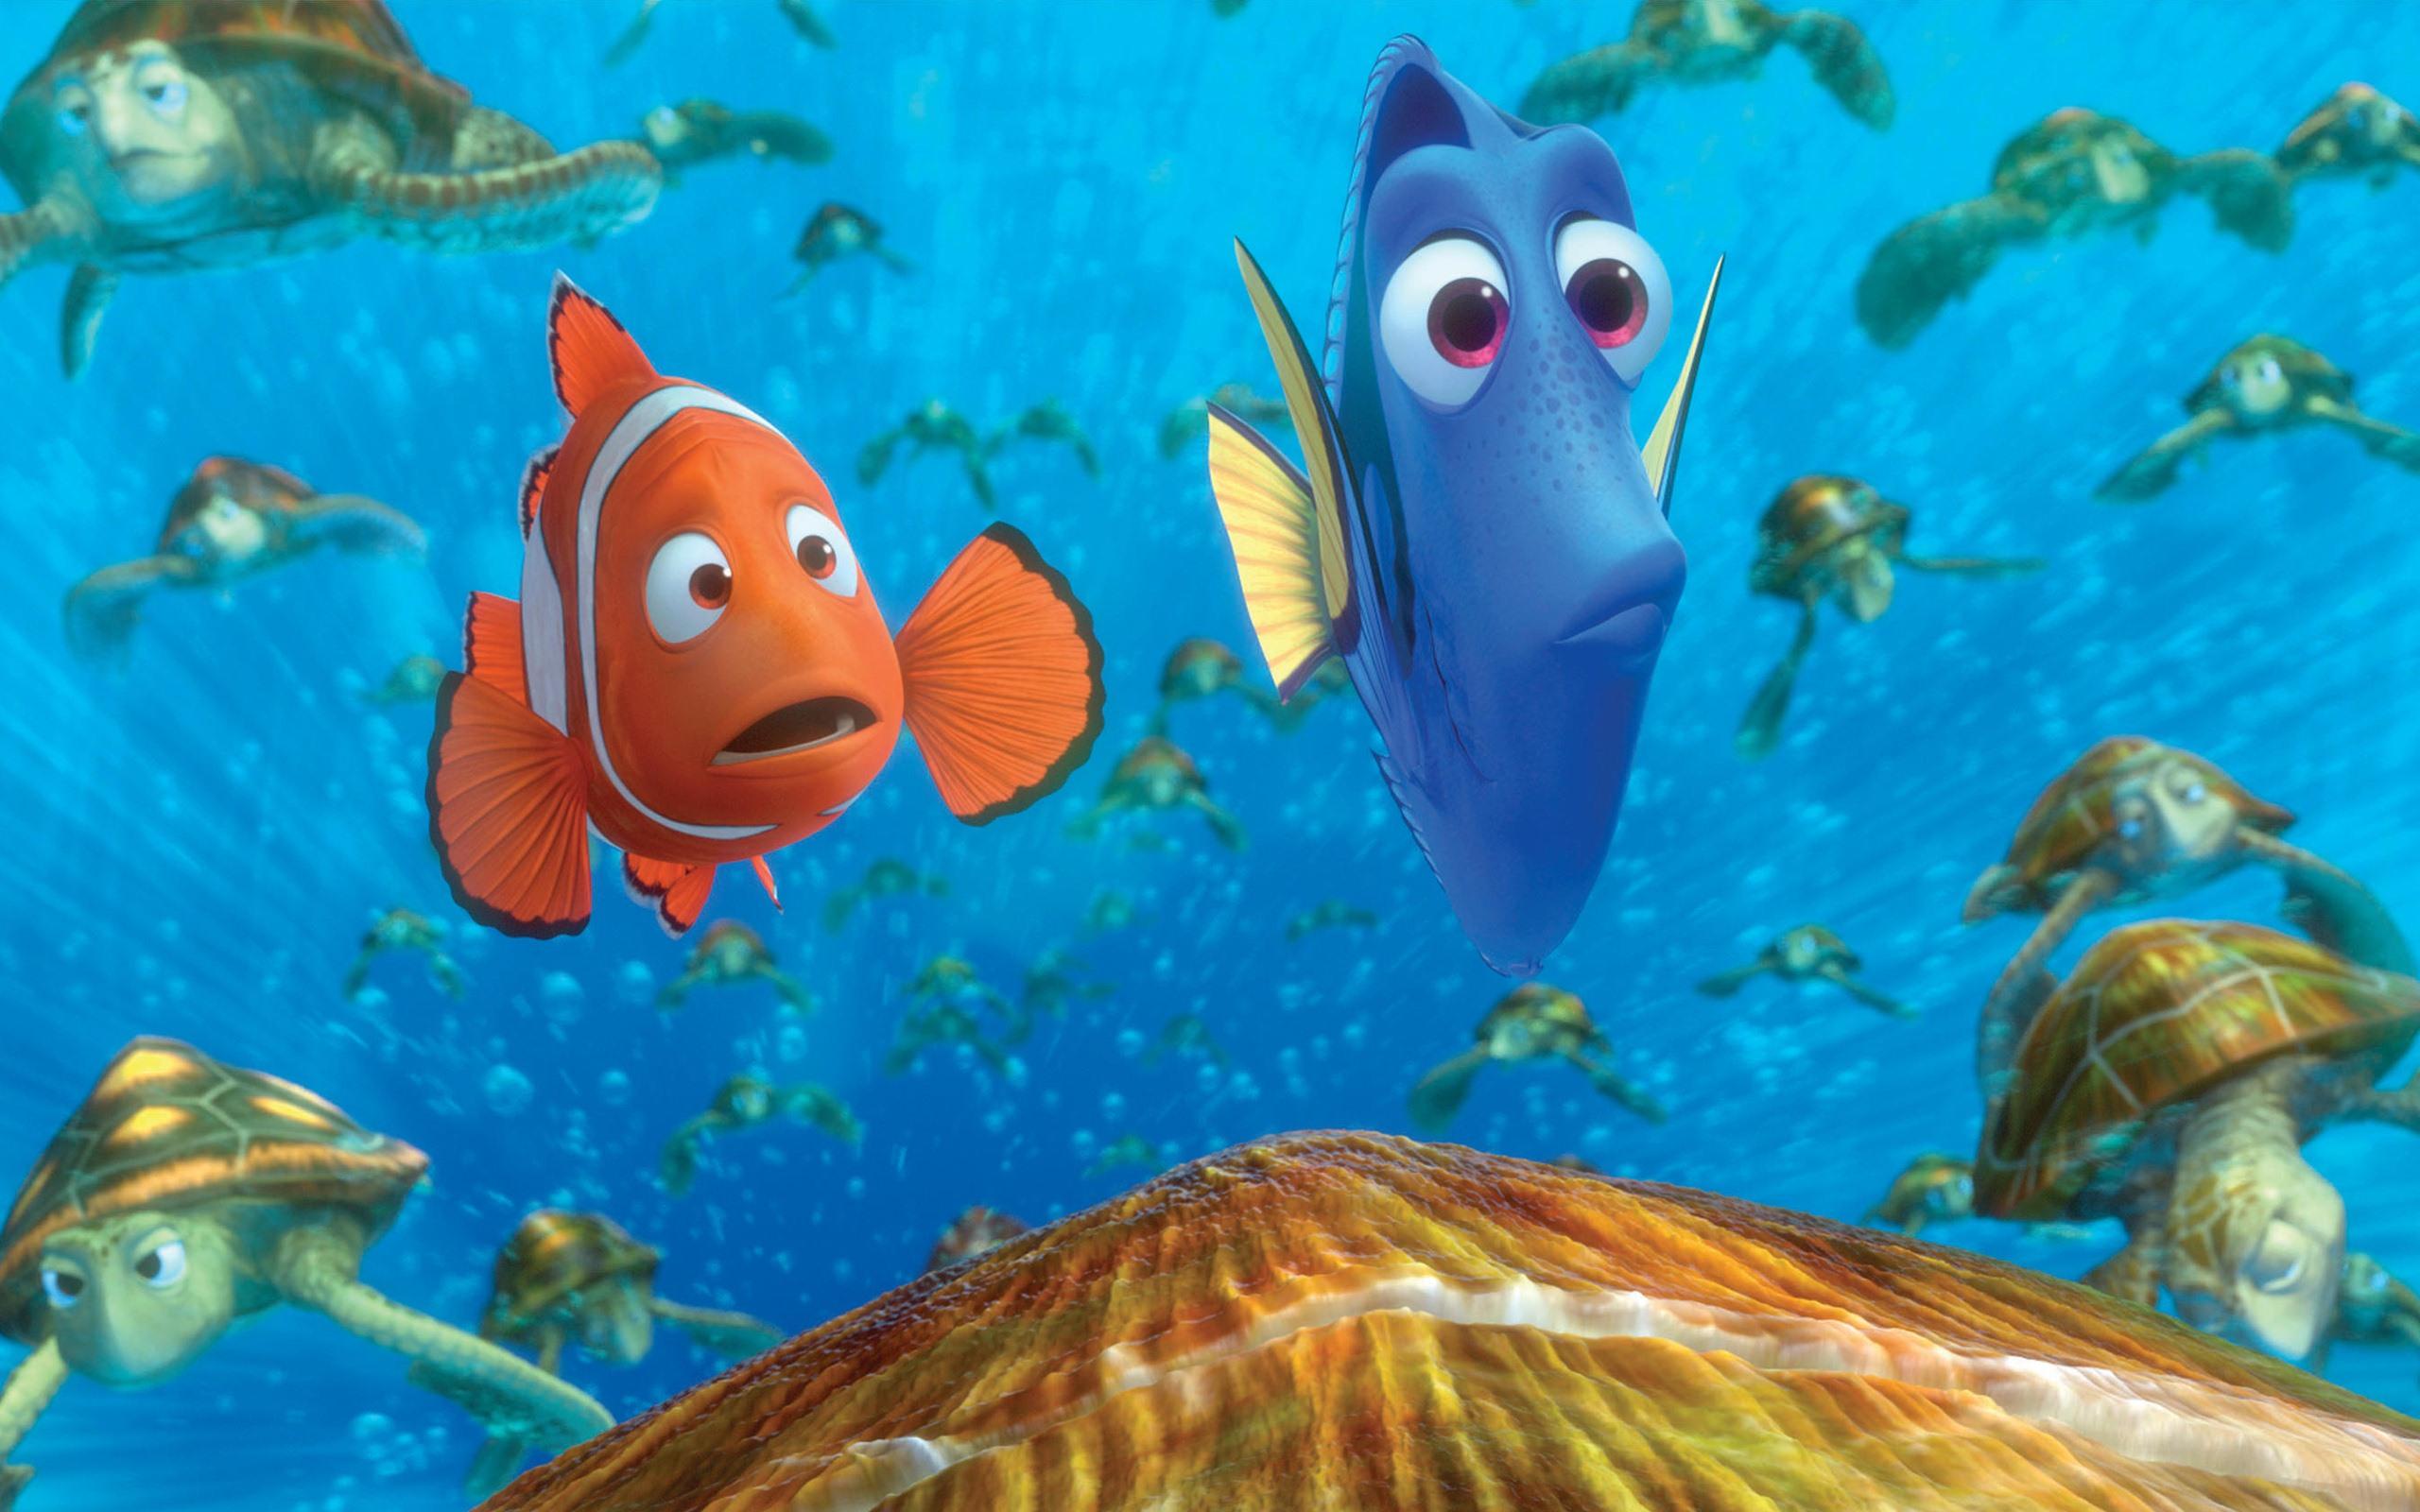 Finding Nemo 3d 2012 Hd Wallpapers 19 2560x1600 Wallpaper